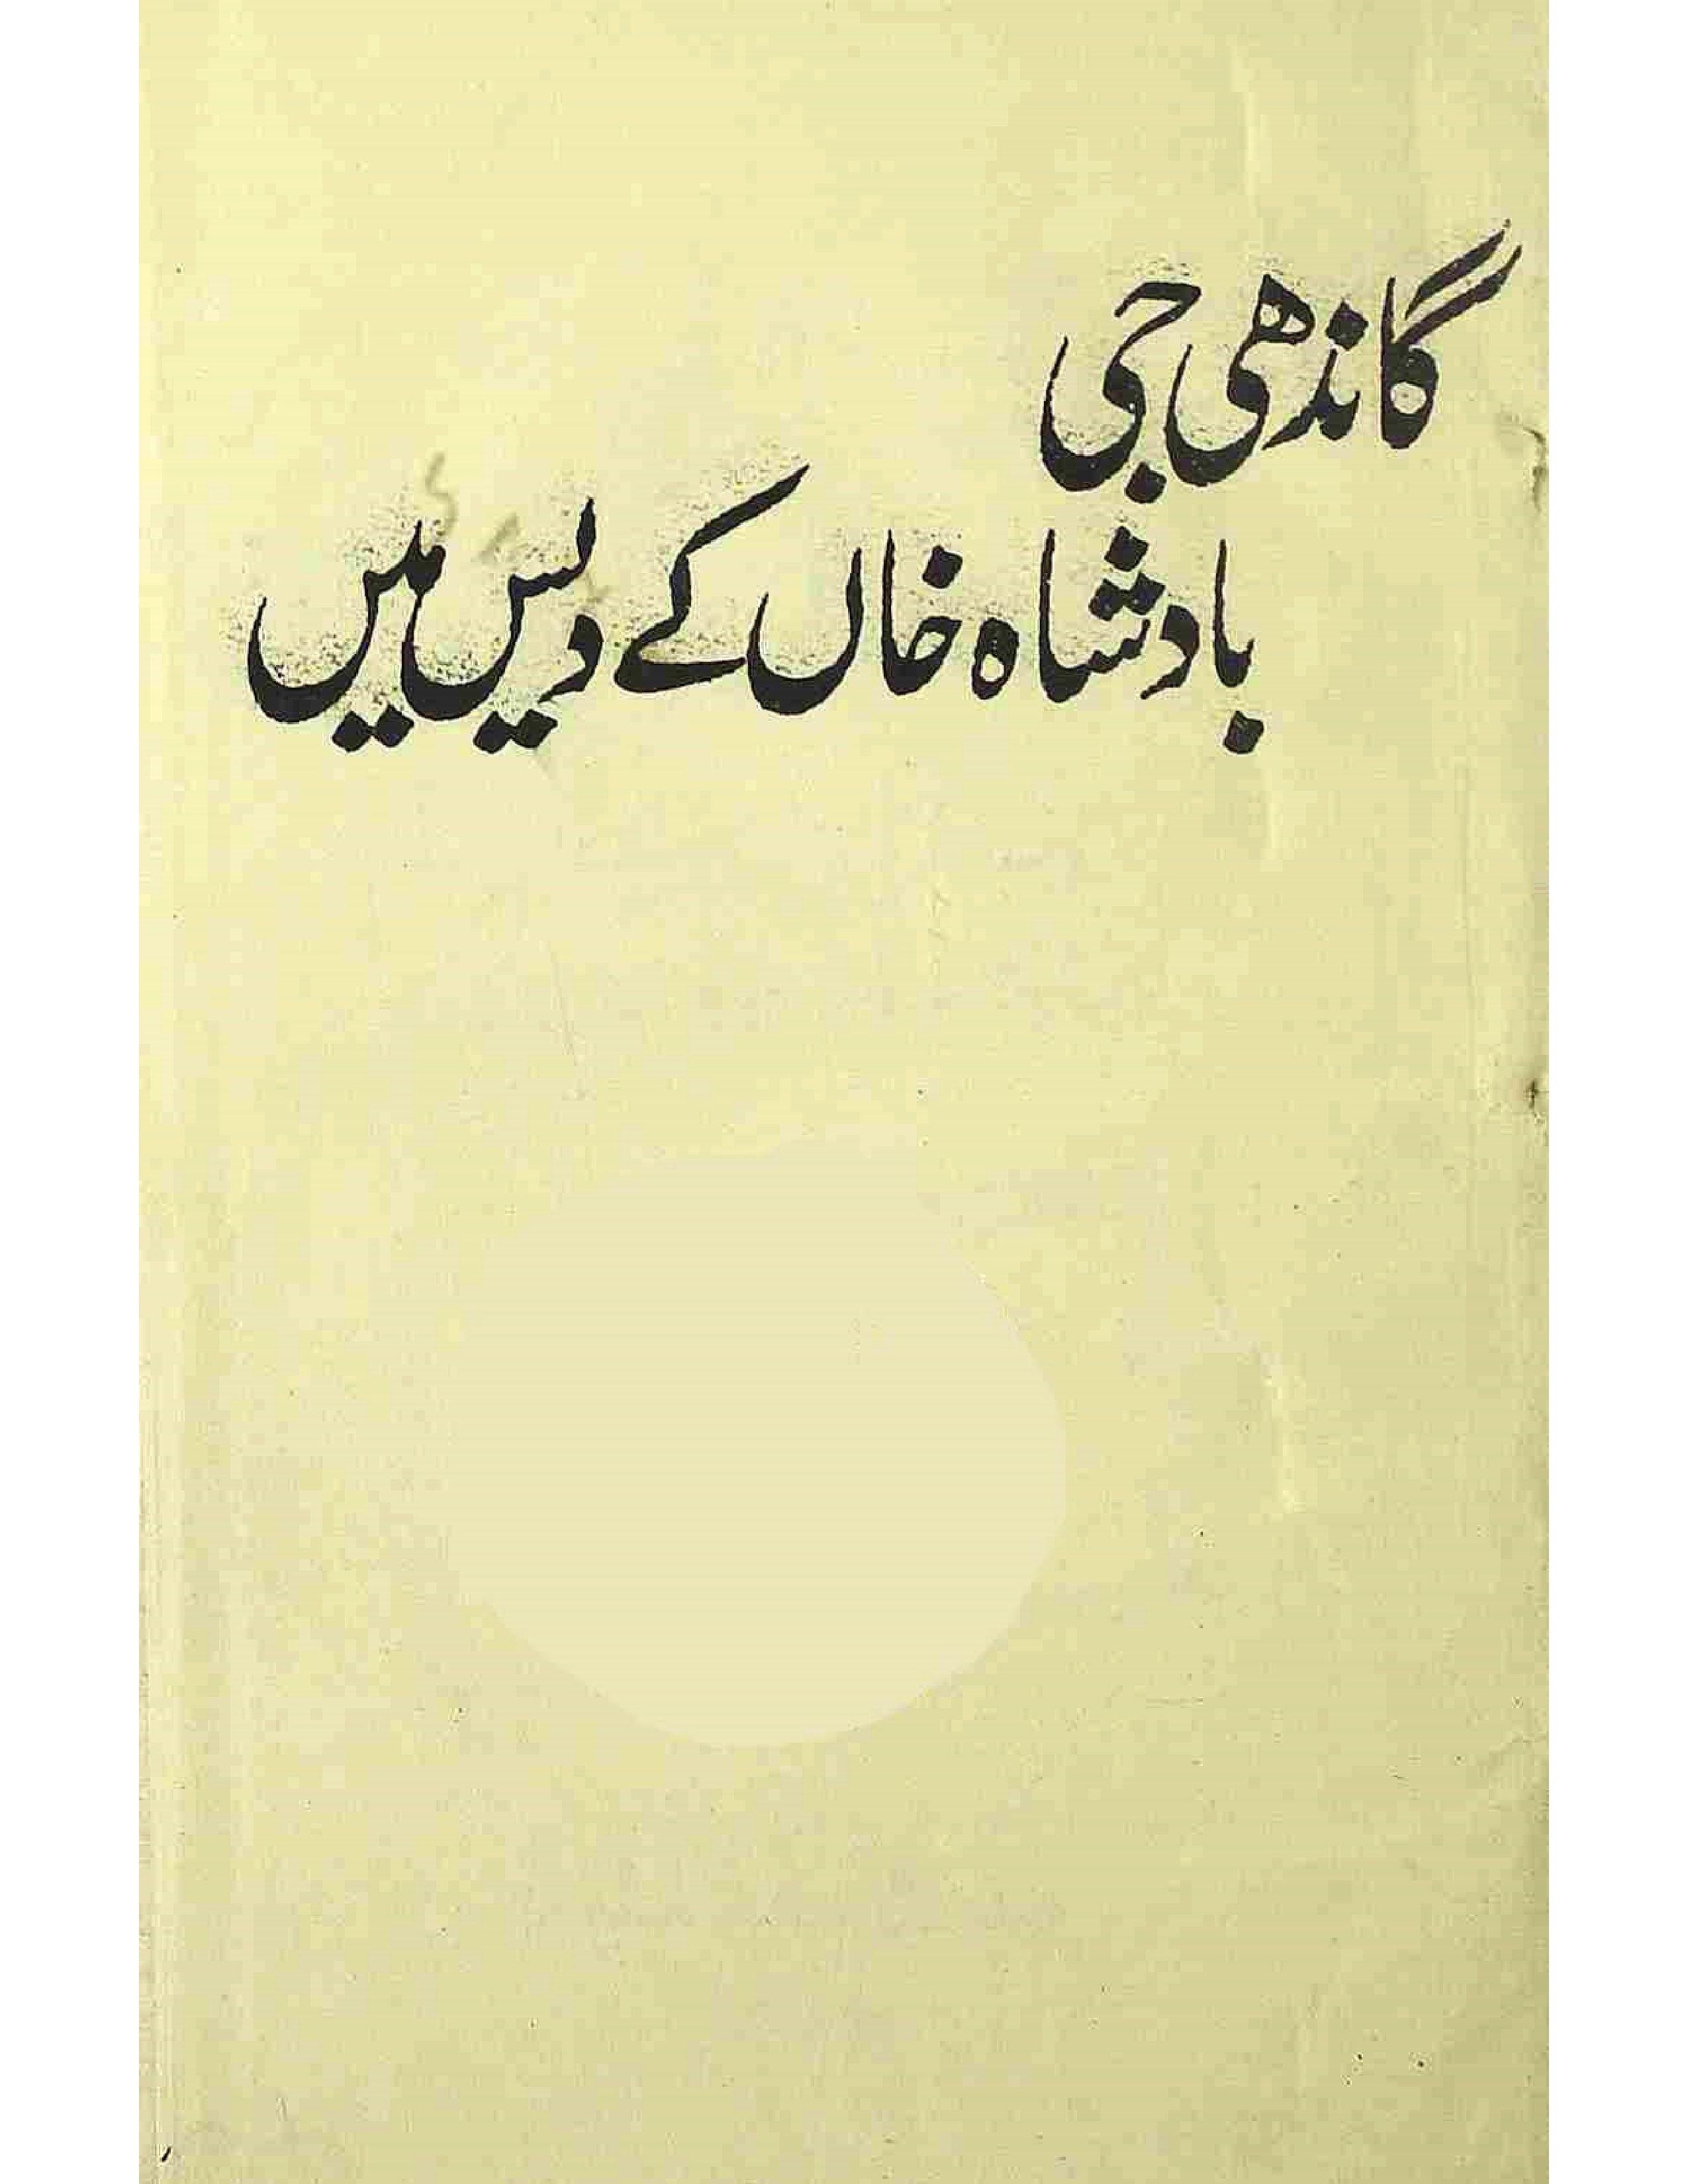 Ghandhi Ji Badshah Khan ke Desh Men